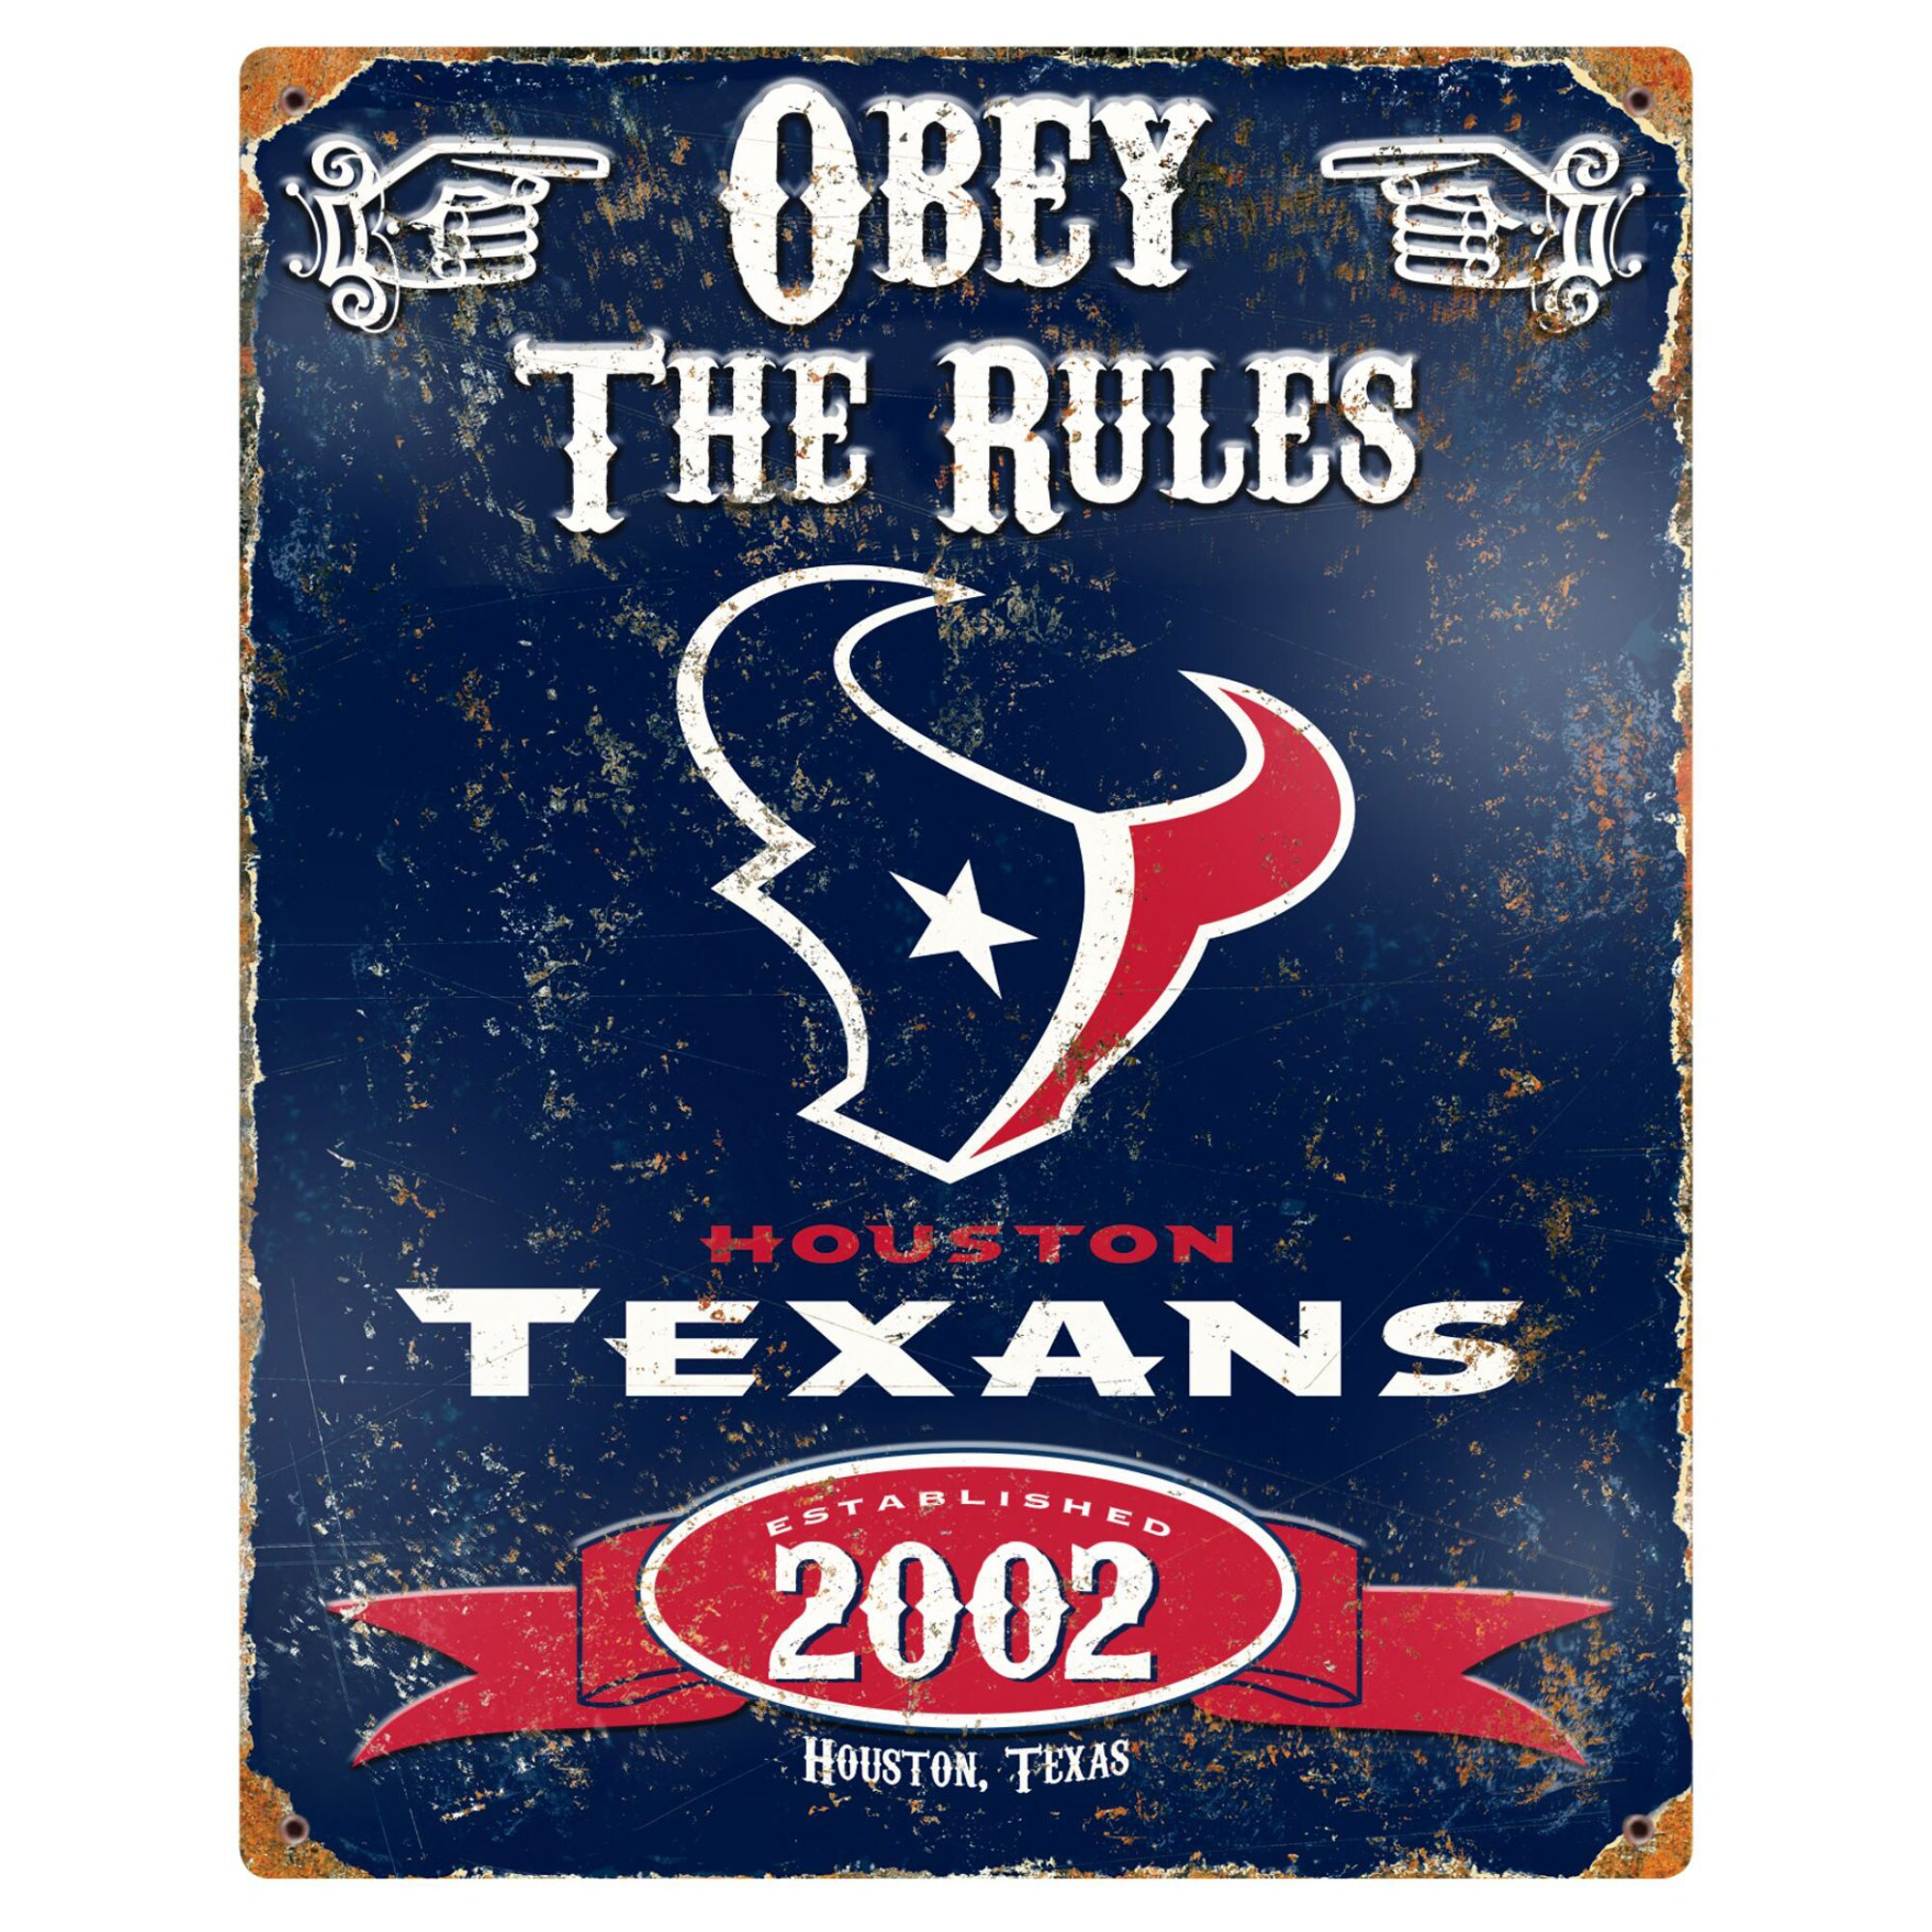 Houston Texans 14.5'' x 11.5'' Embossed Metal Sign